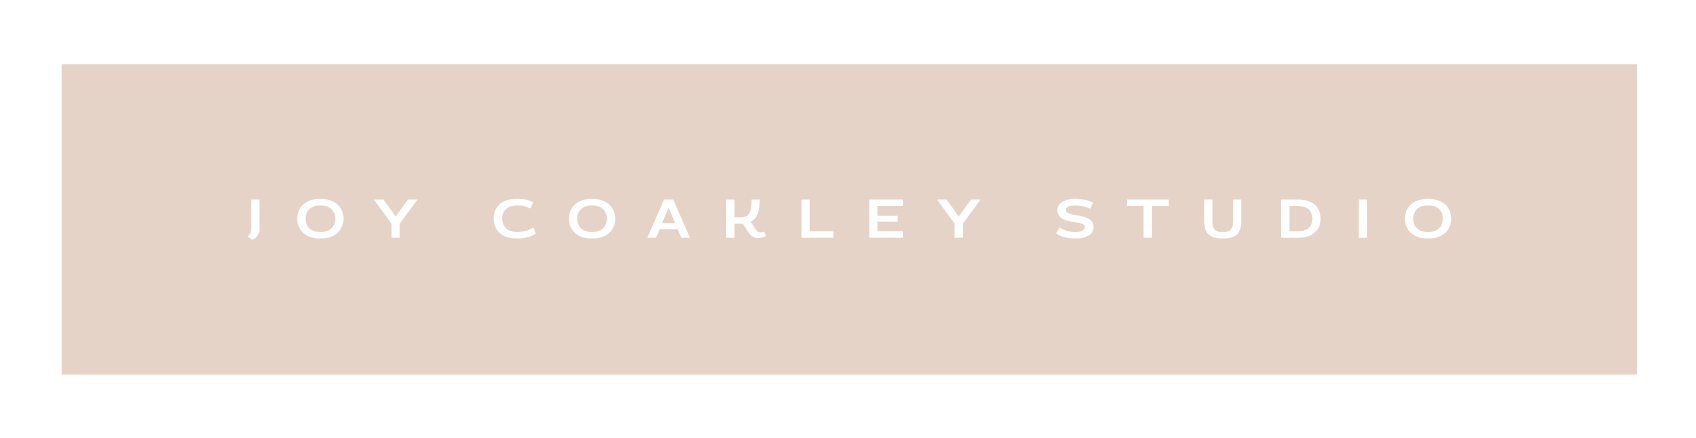 Joy Coakley Studio_Alternate Logo 1 copy.png